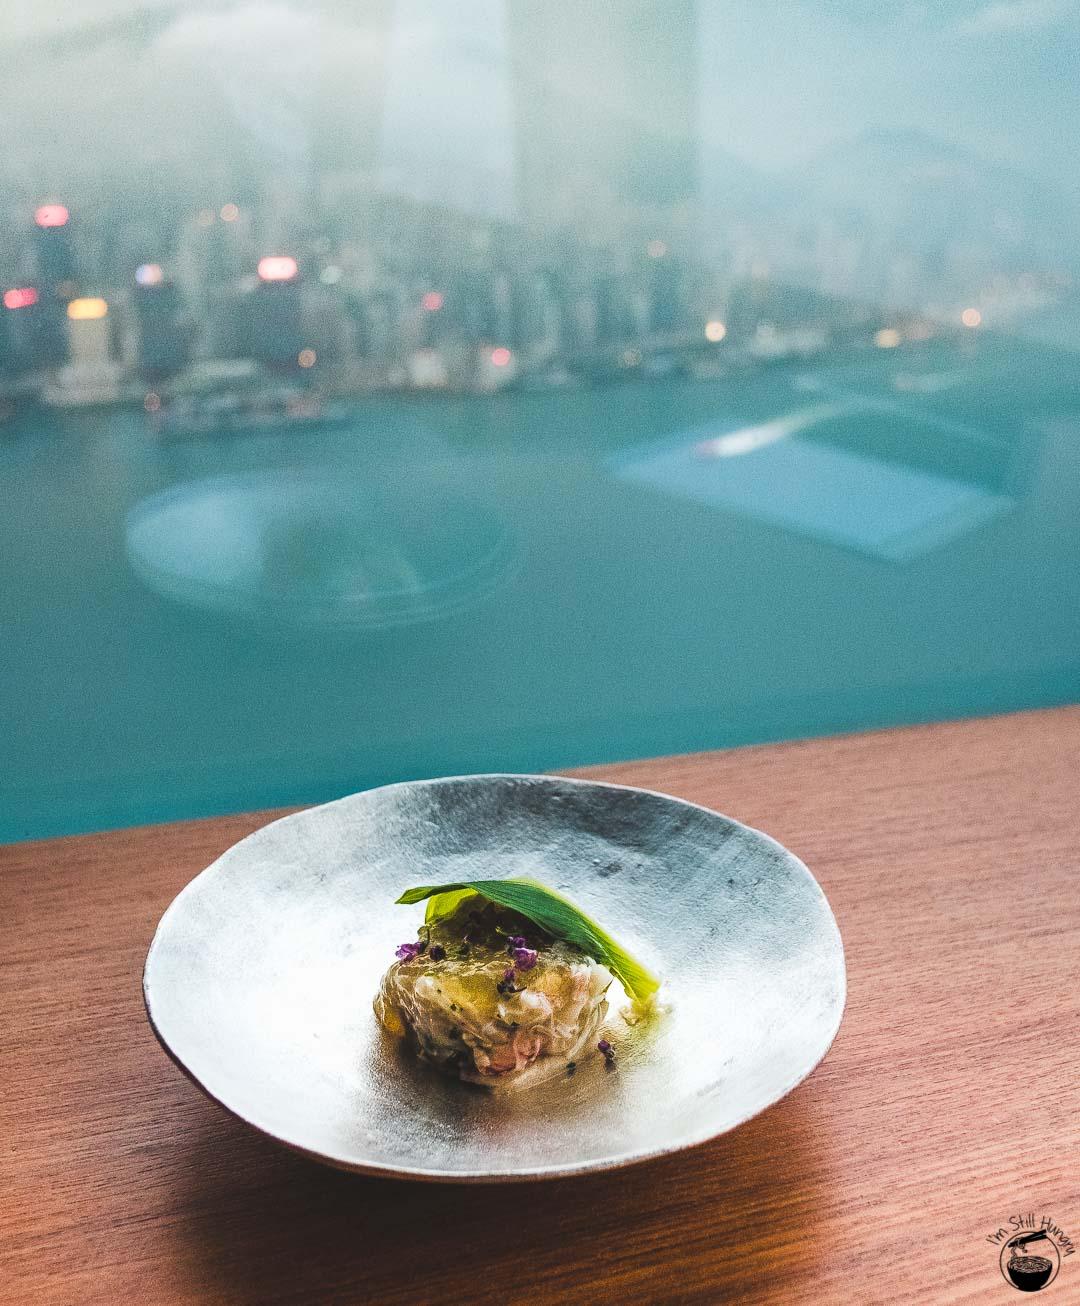 Tenku Ryugin Hong Kong Hokkaido kegani & hokki clam salad w/sudachi jelly